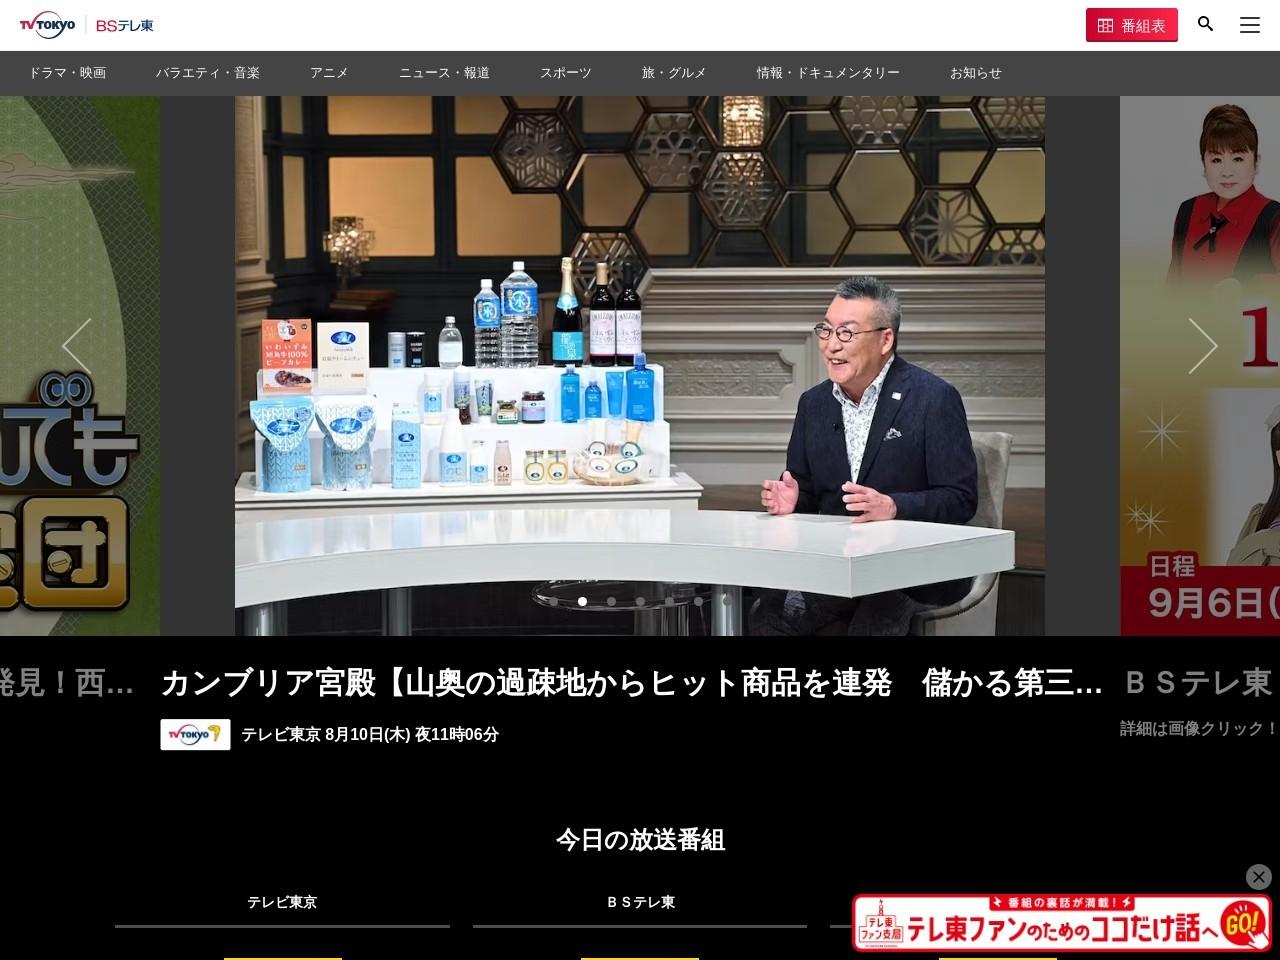 http://www.tv-tokyo.co.jp/mv/anitv_robocar-poli2/